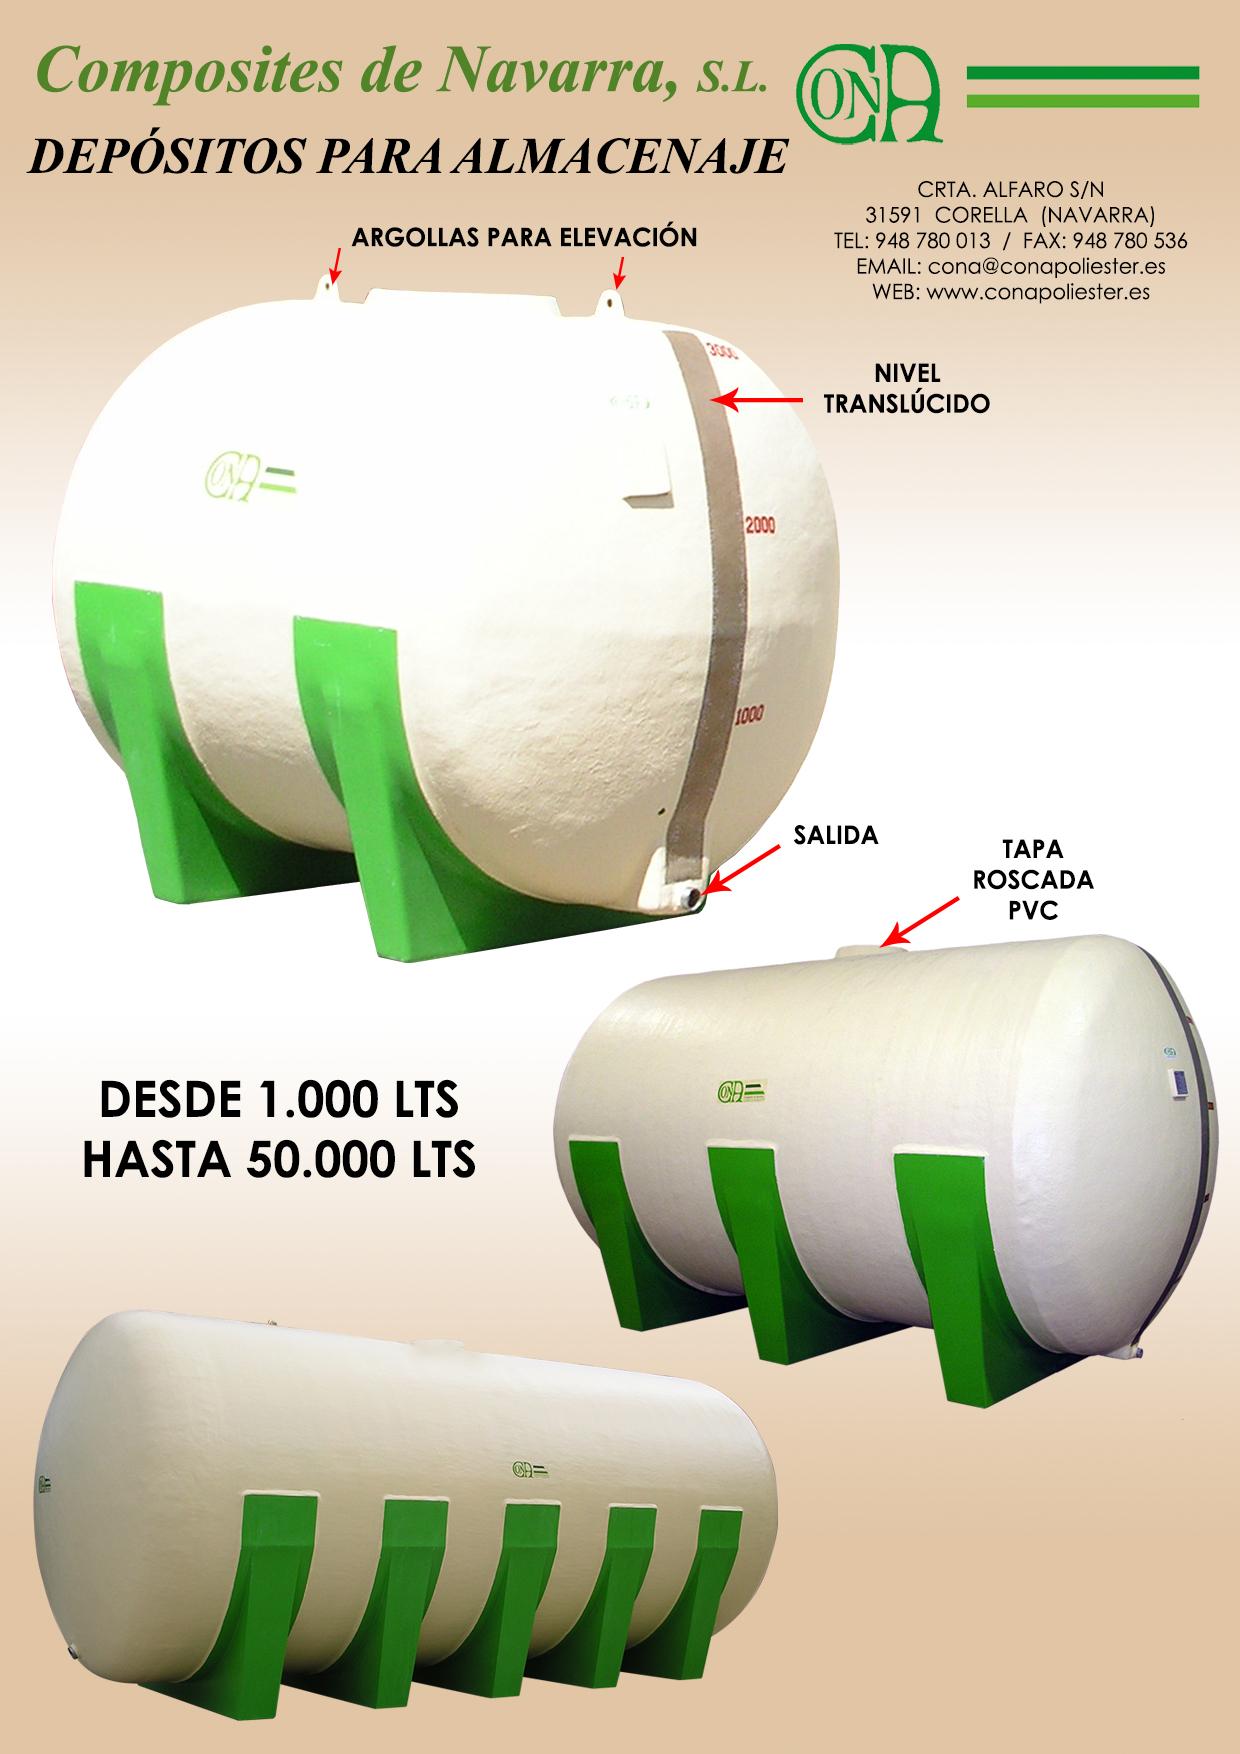 Depósitos horizontales para almacenaje